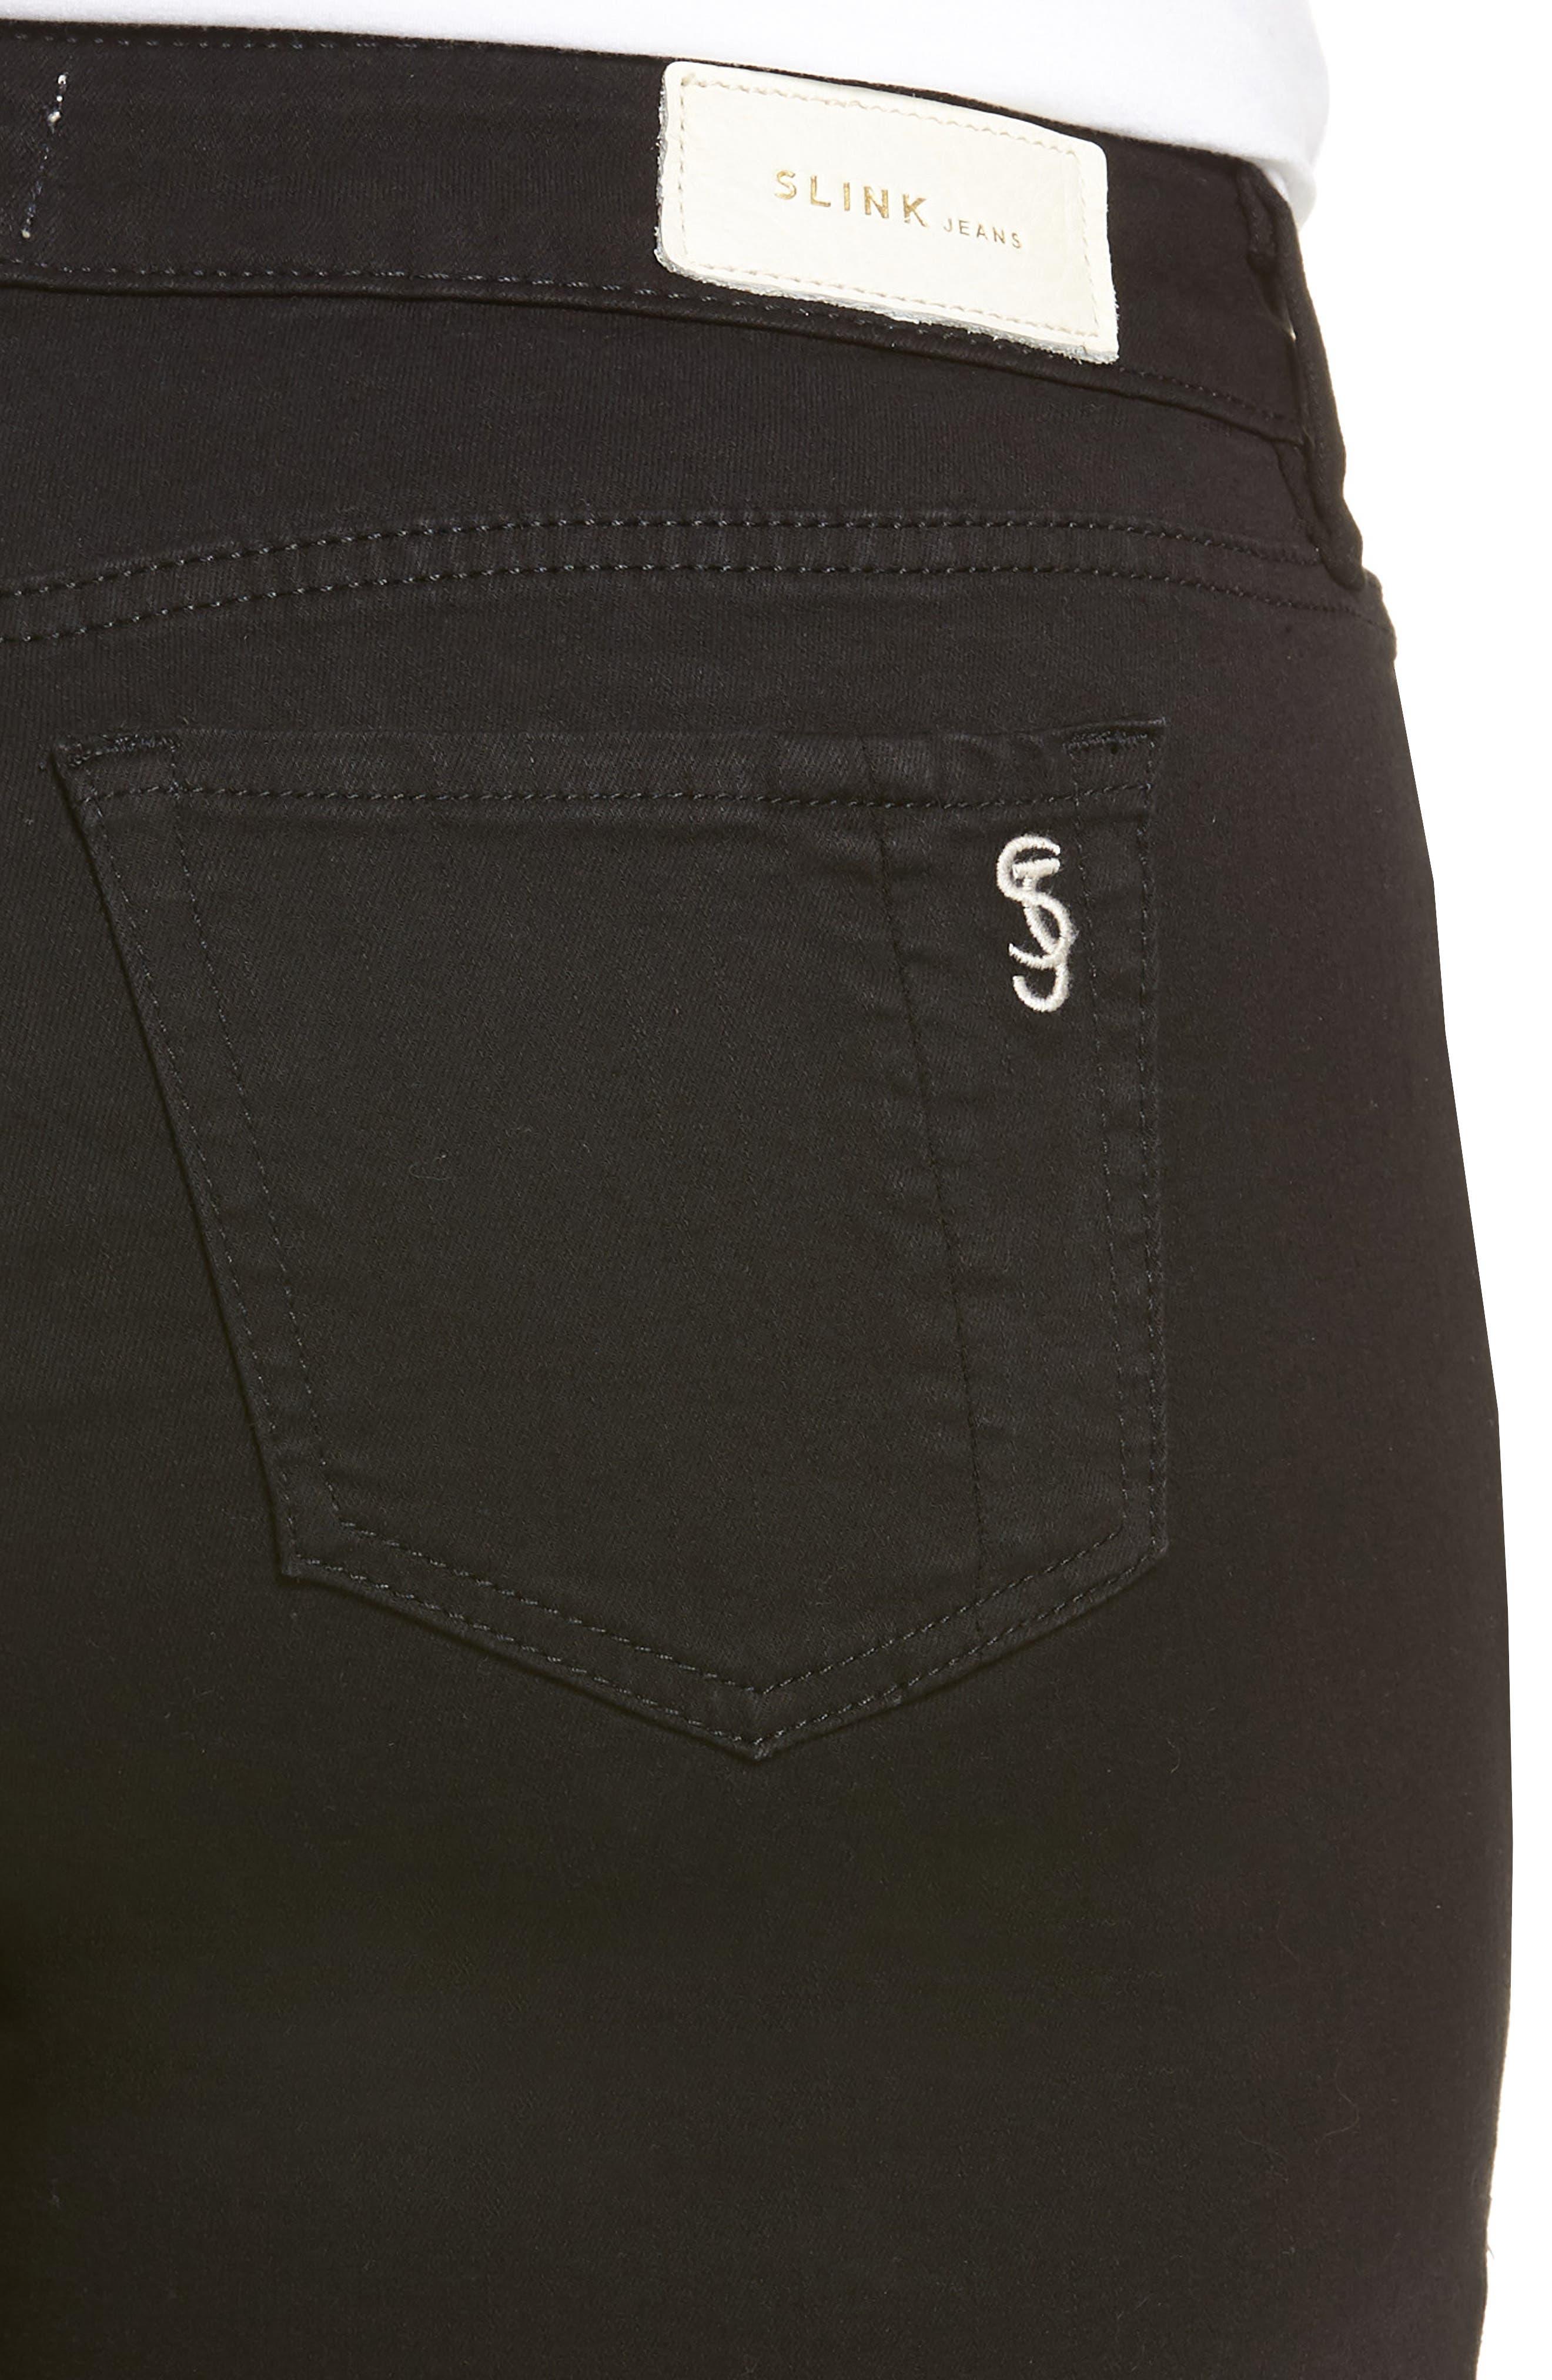 Denim Shorts,                             Alternate thumbnail 4, color,                             001